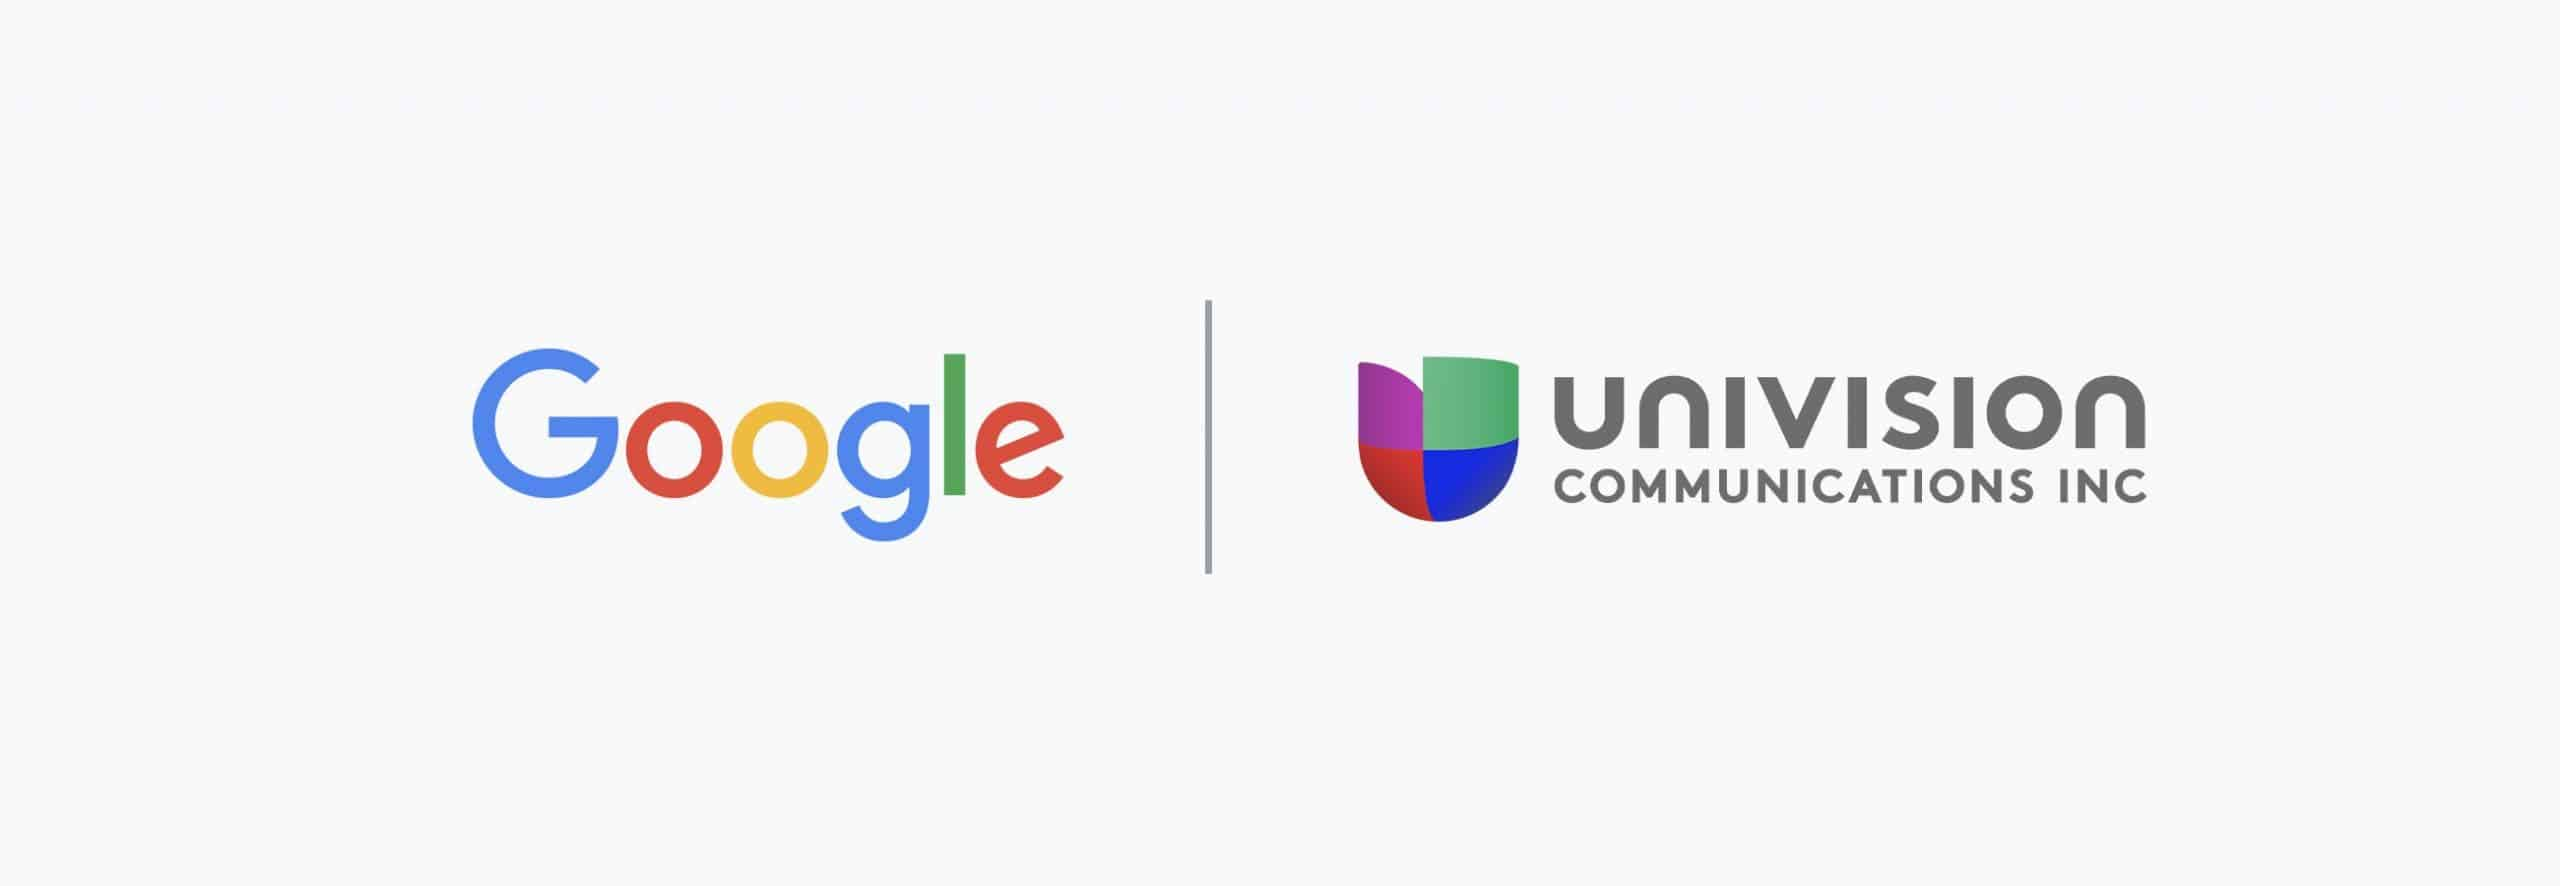 Google cloud computing Univision